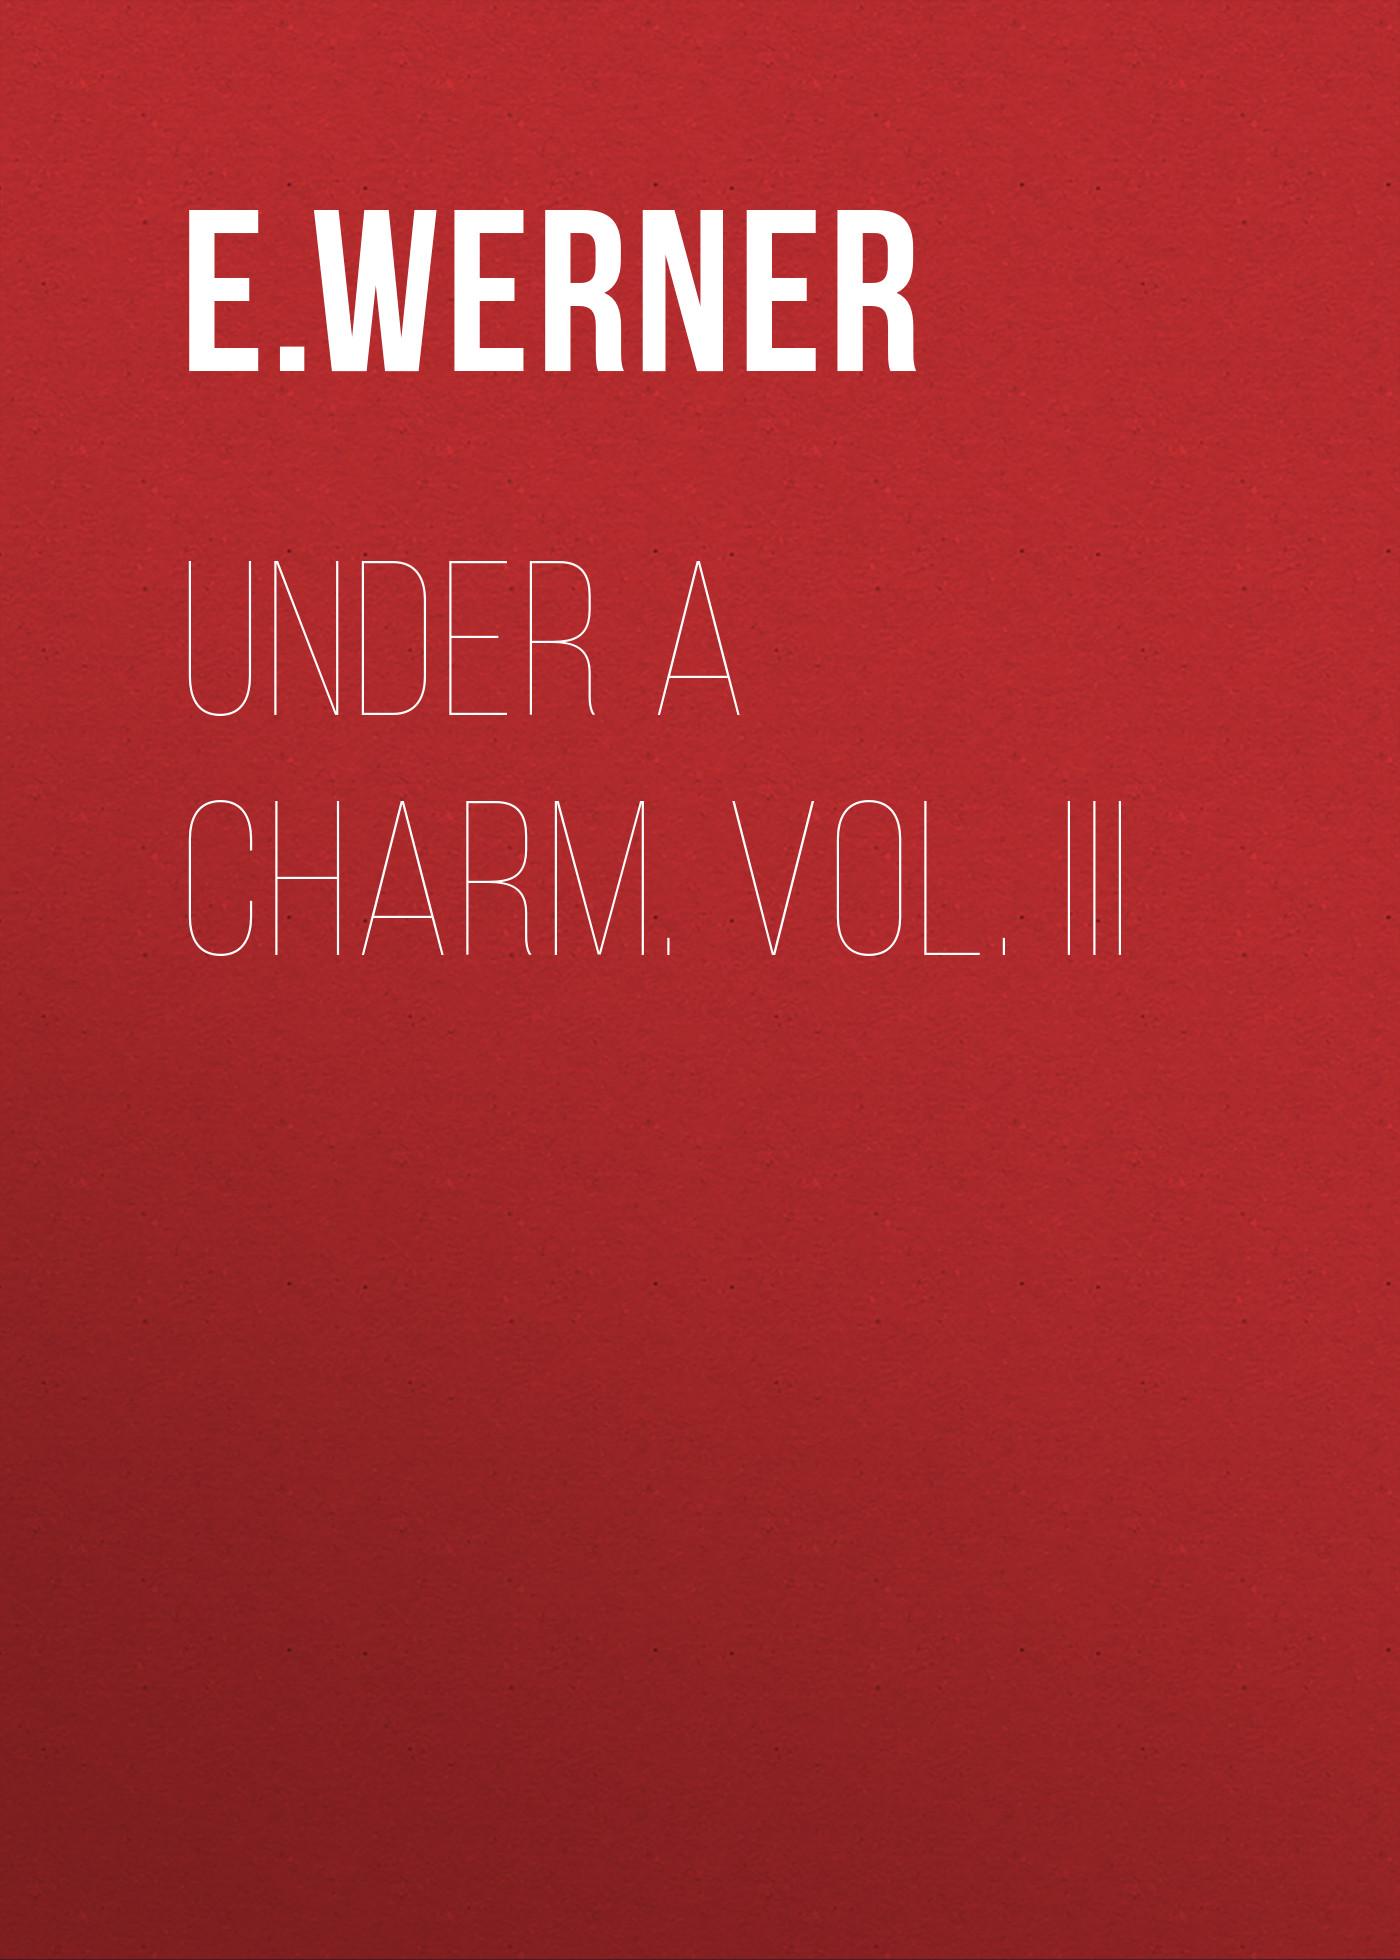 E. Werner Under a Charm. Vol. III e werner under a charm vol i